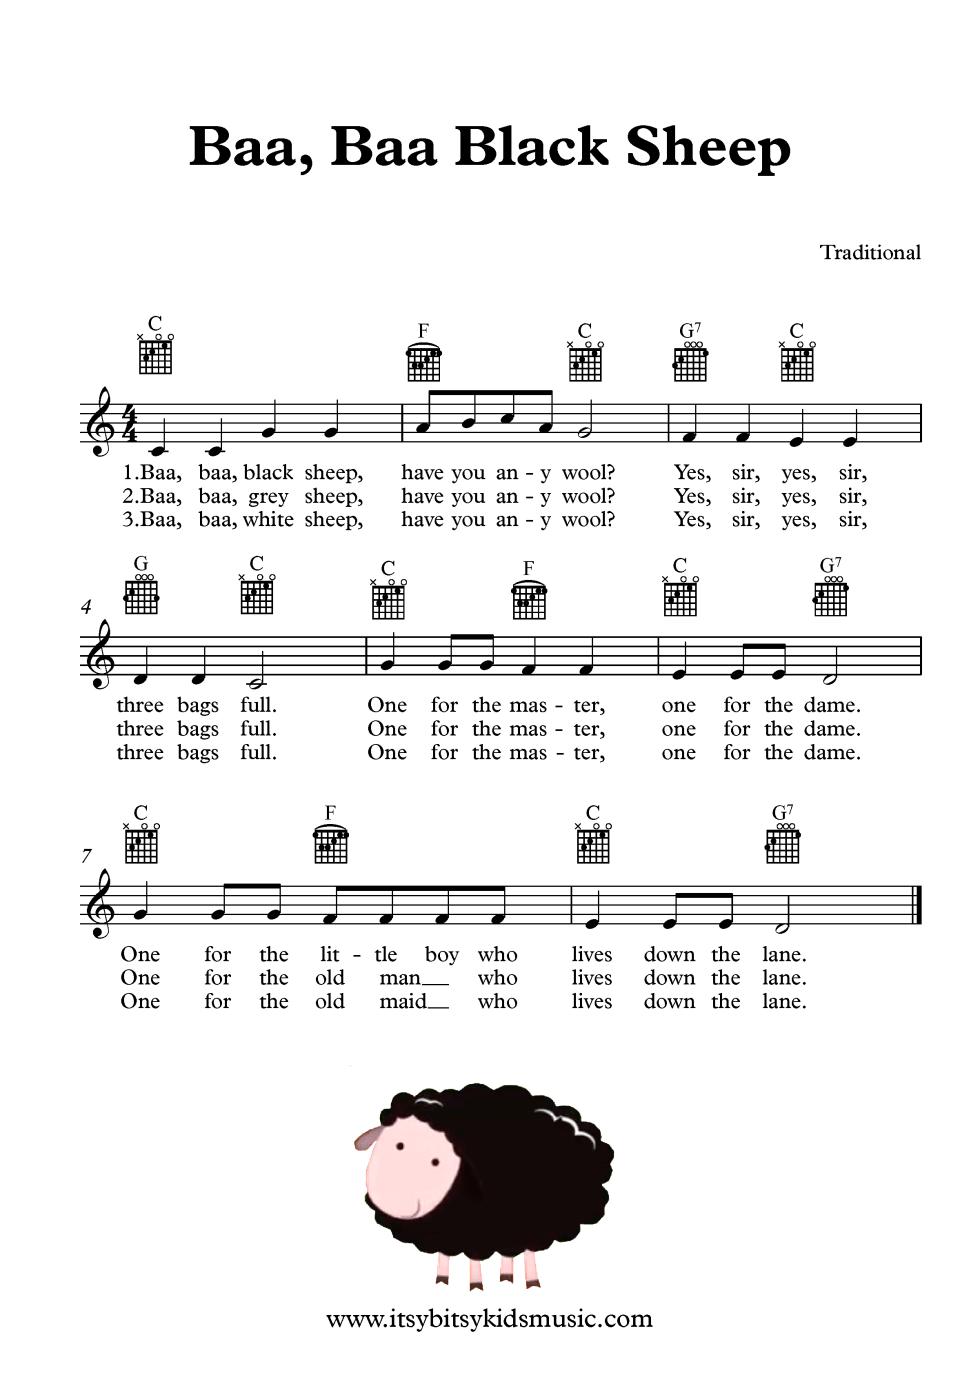 Baa Baa Black Sheep Sheet Music With Chords And Lyrics